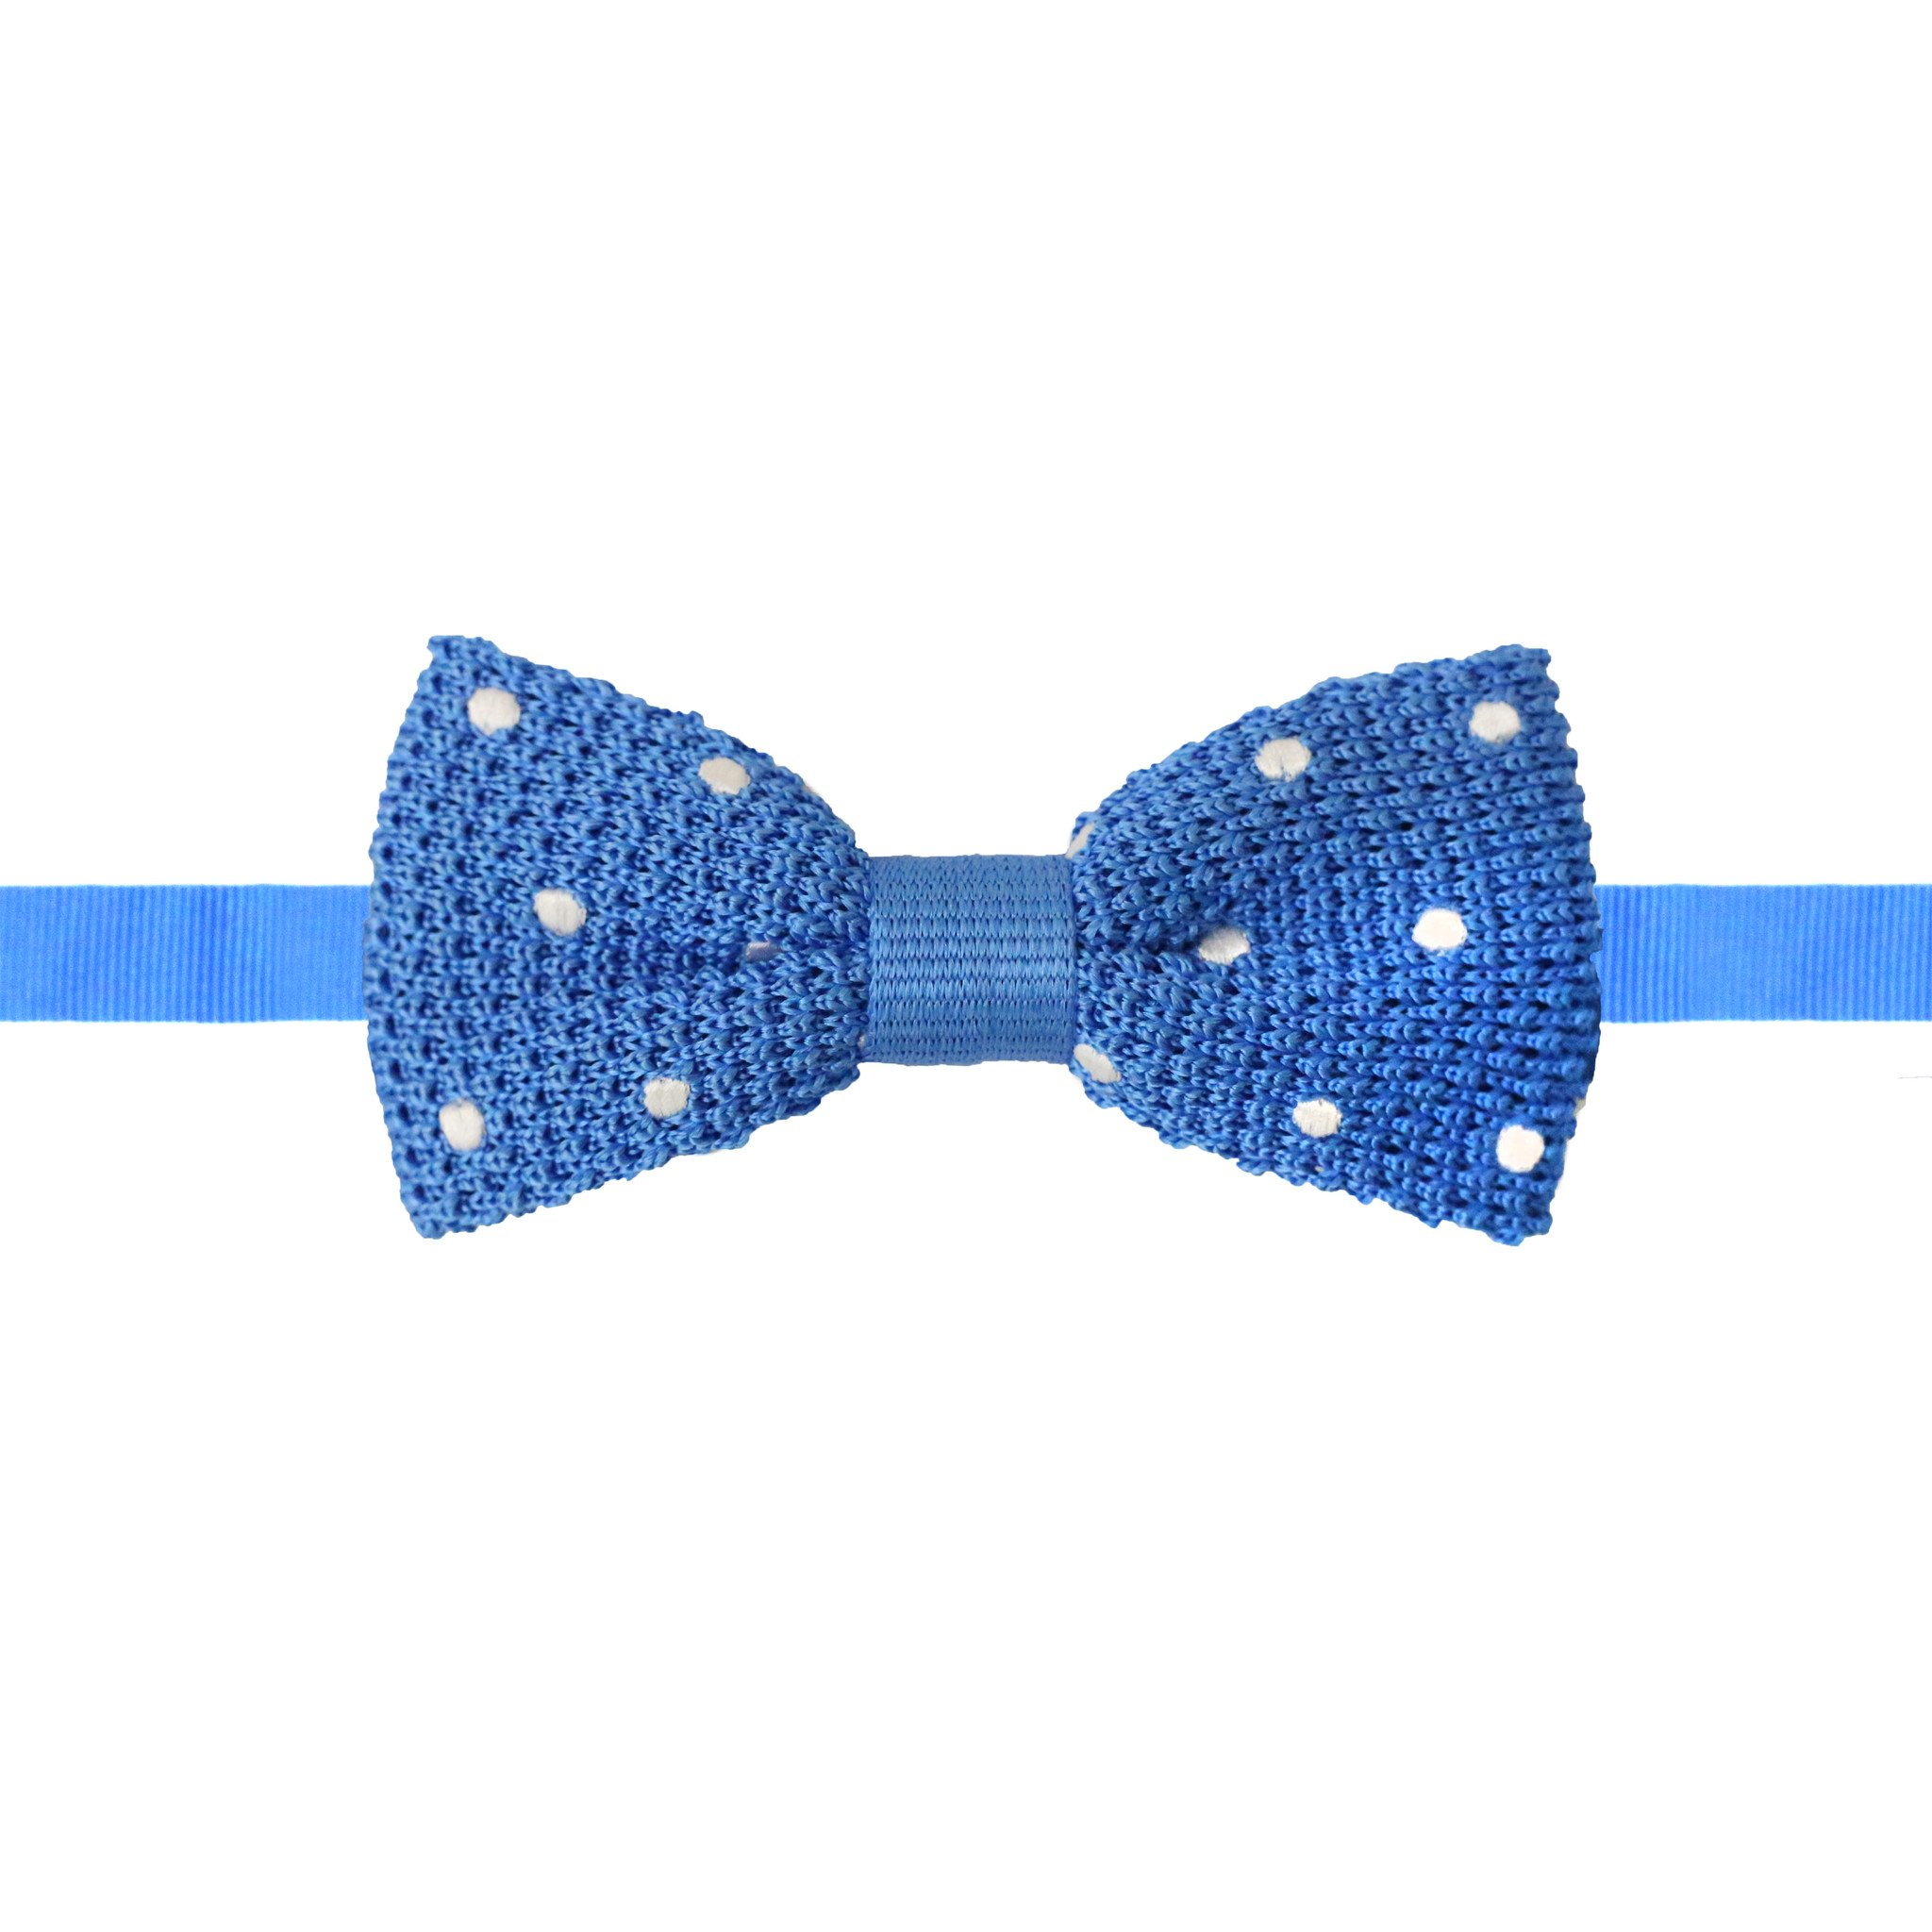 Knit Polka Dot Bow Tie Sky Blue